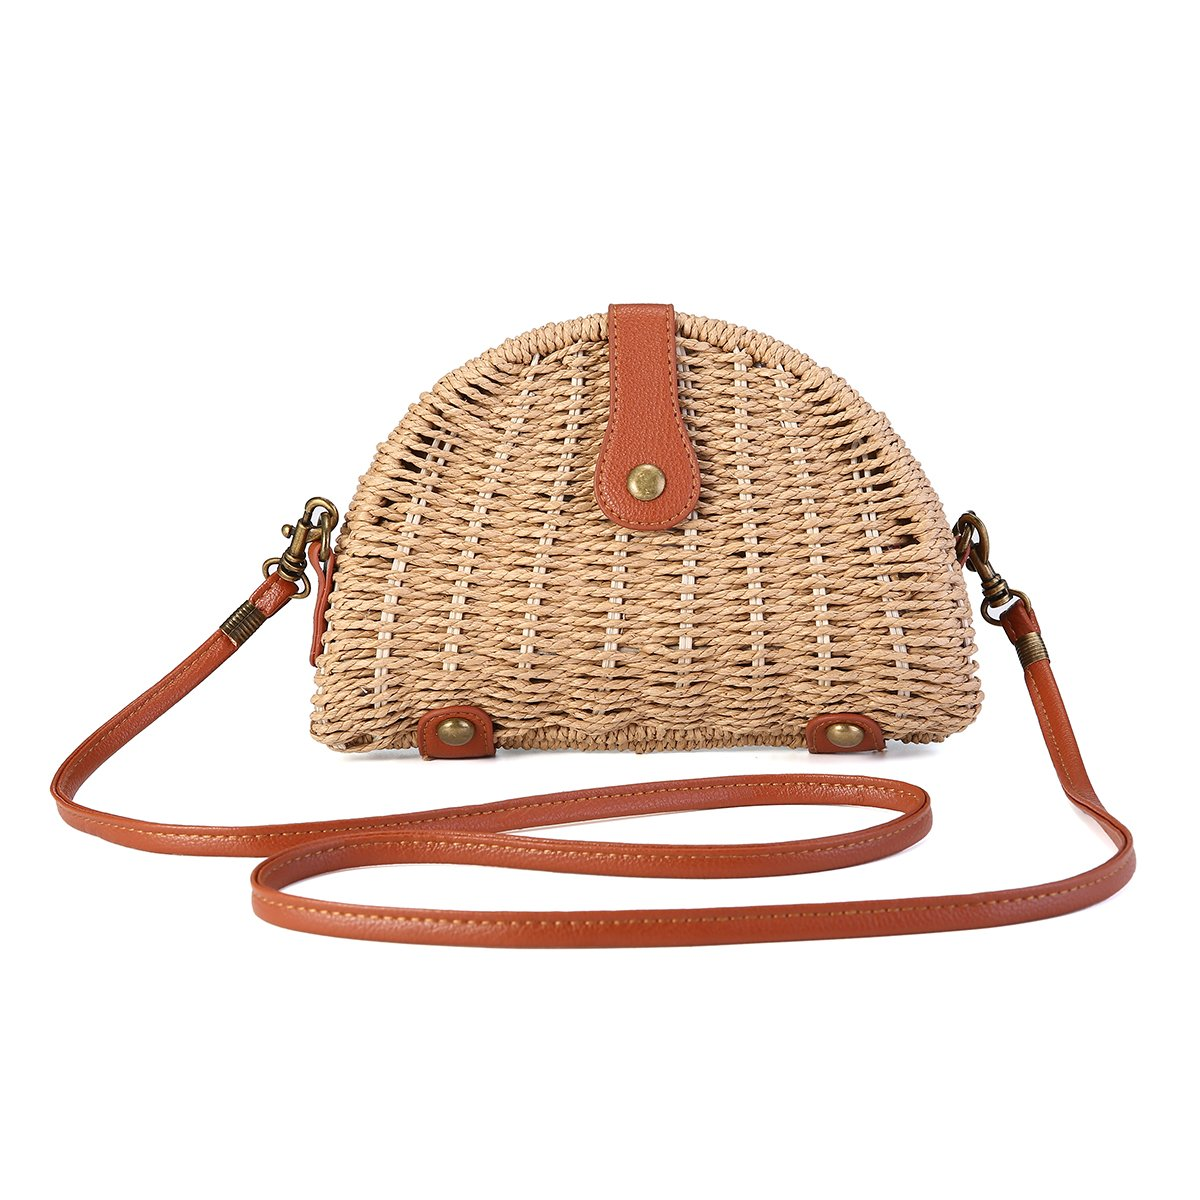 Crossbody Straw Bag, JOSEKO Womens Straw Handbag Shoulder Bag for Beach Travel and Everyday Use Light Brown 8.07